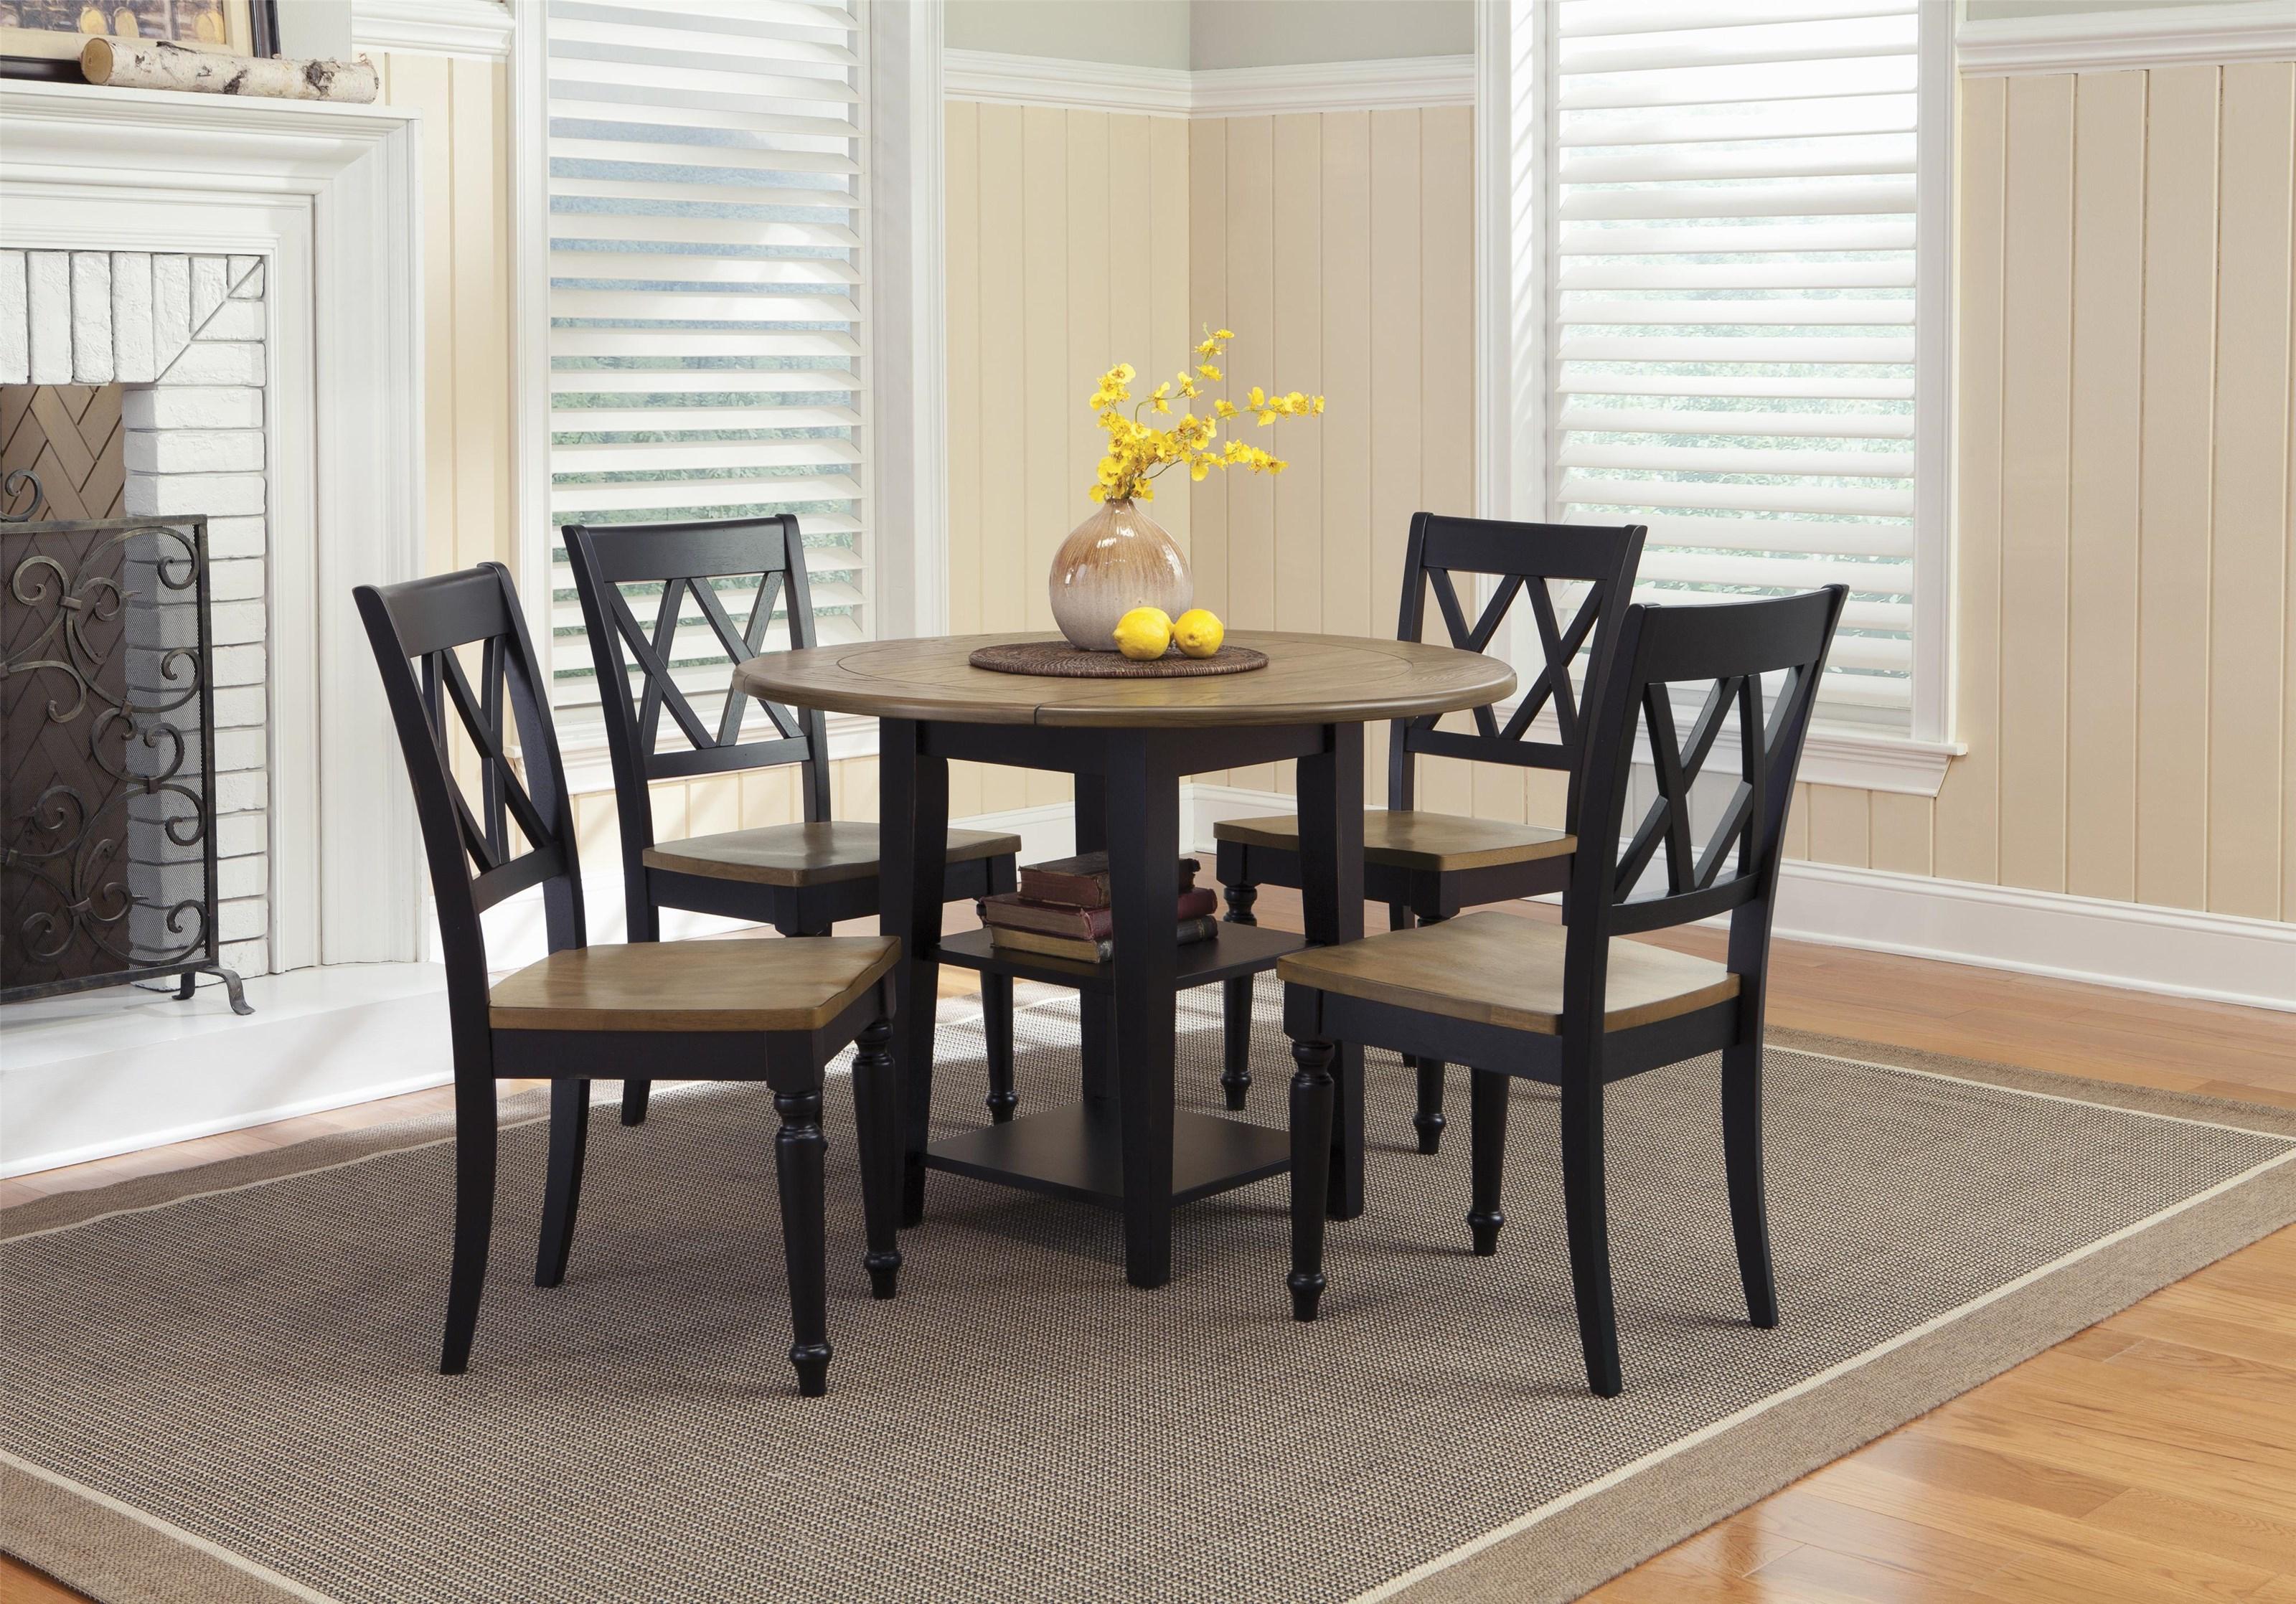 Liberty Furniture Ellie 5-Piece Dining Set - Item Number: D18641-5PC